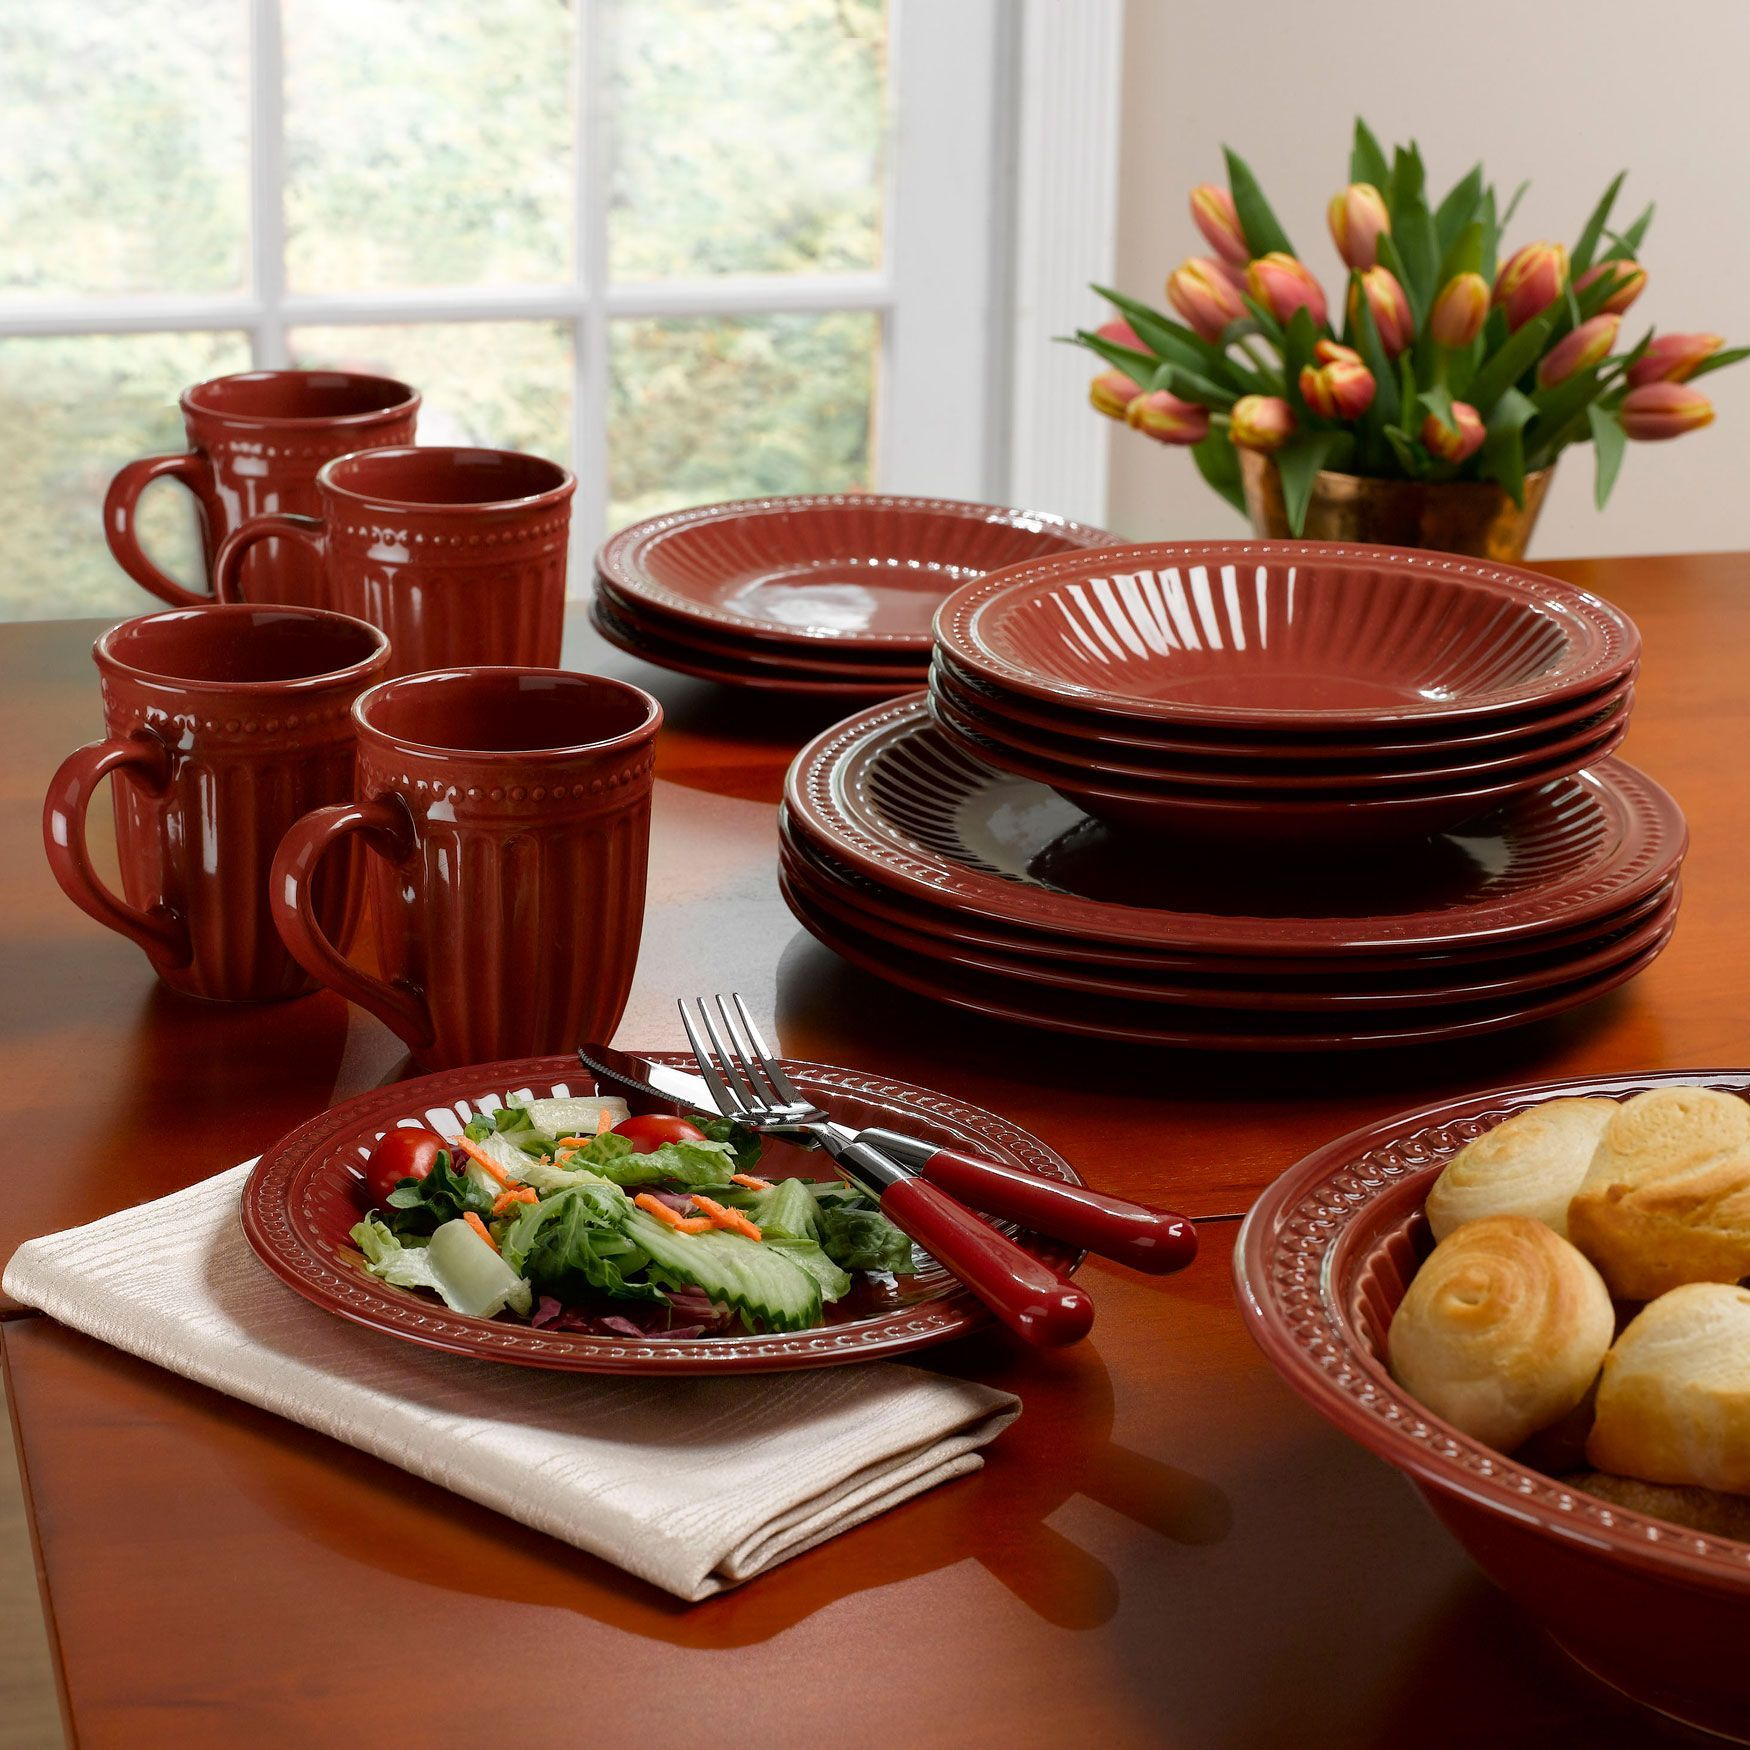 16 Pc Set Textured Burgundy Stoneware Dinnerware Dinnerware Flatware Brylanehome Stoneware Dinnerware Dinnerware Stoneware